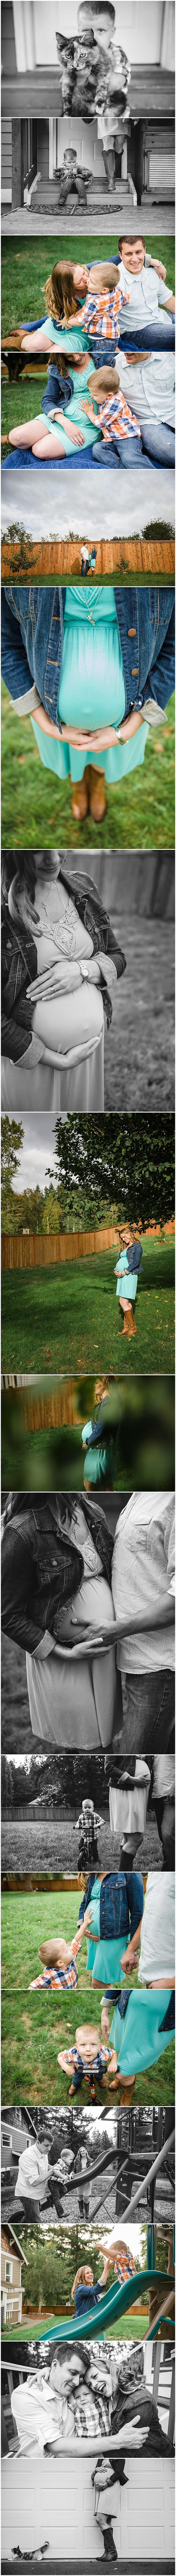 Baker Family // Issaquah Maternity Photographer